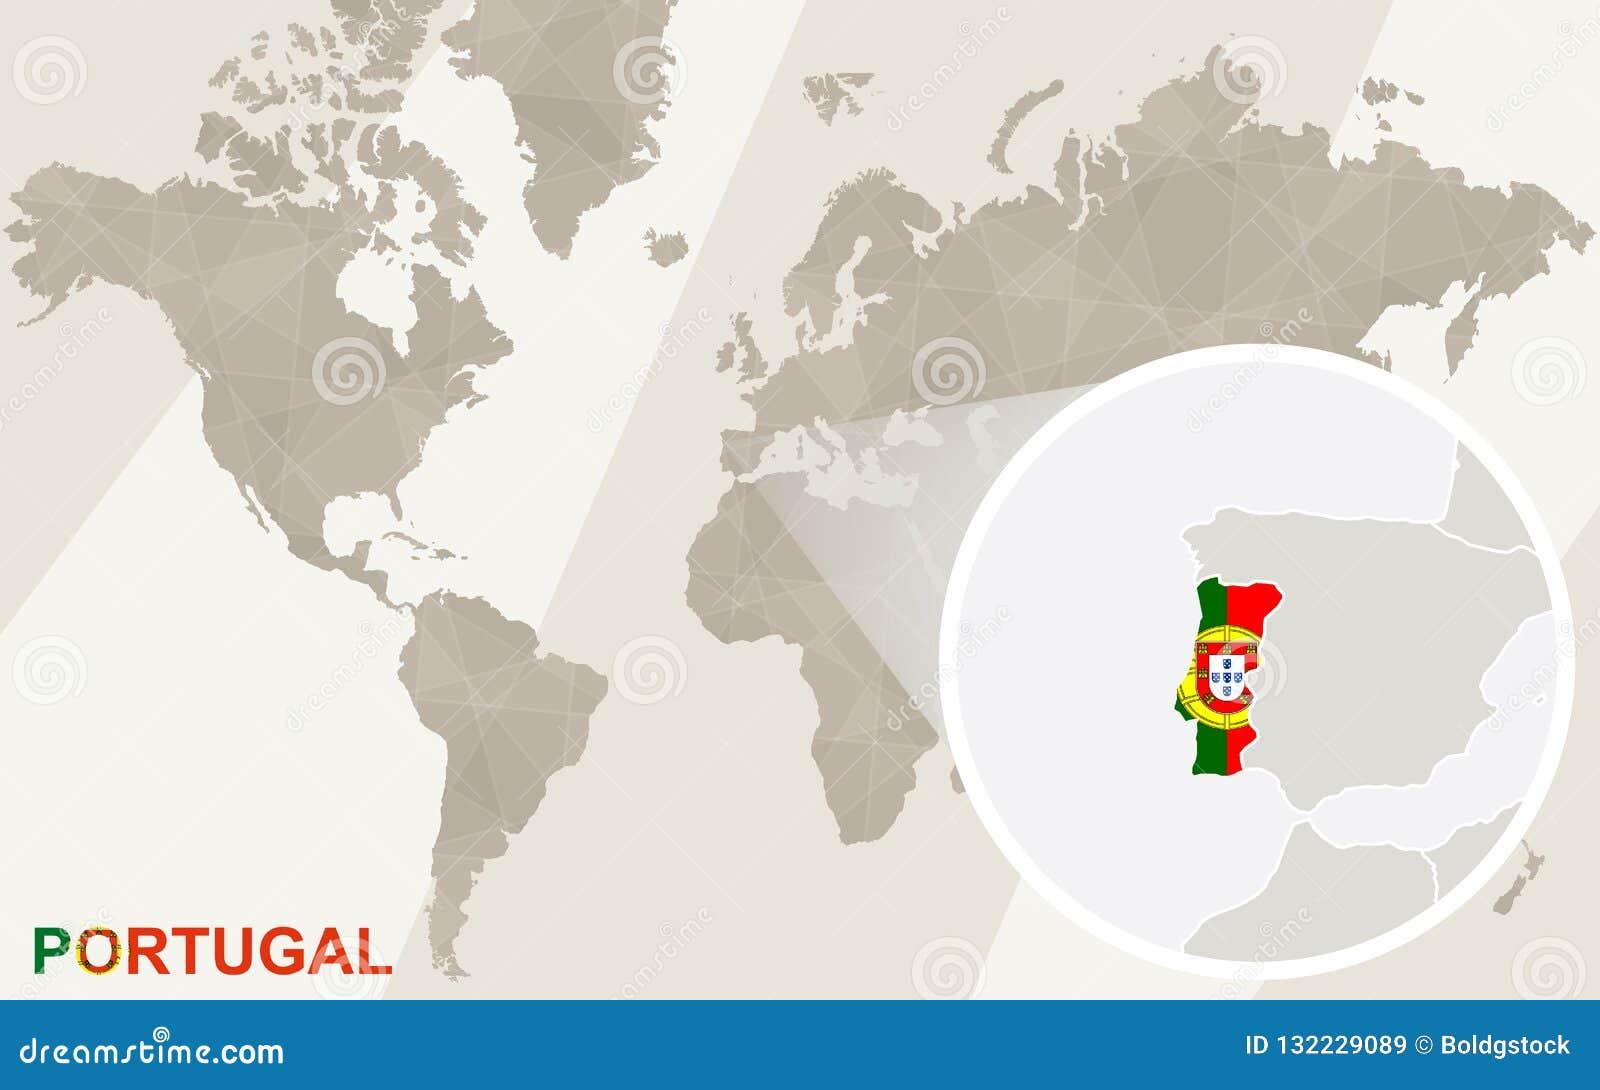 Zumbido No Mapa E Na Bandeira De Portugal Mapa De Mundo Ilustracao